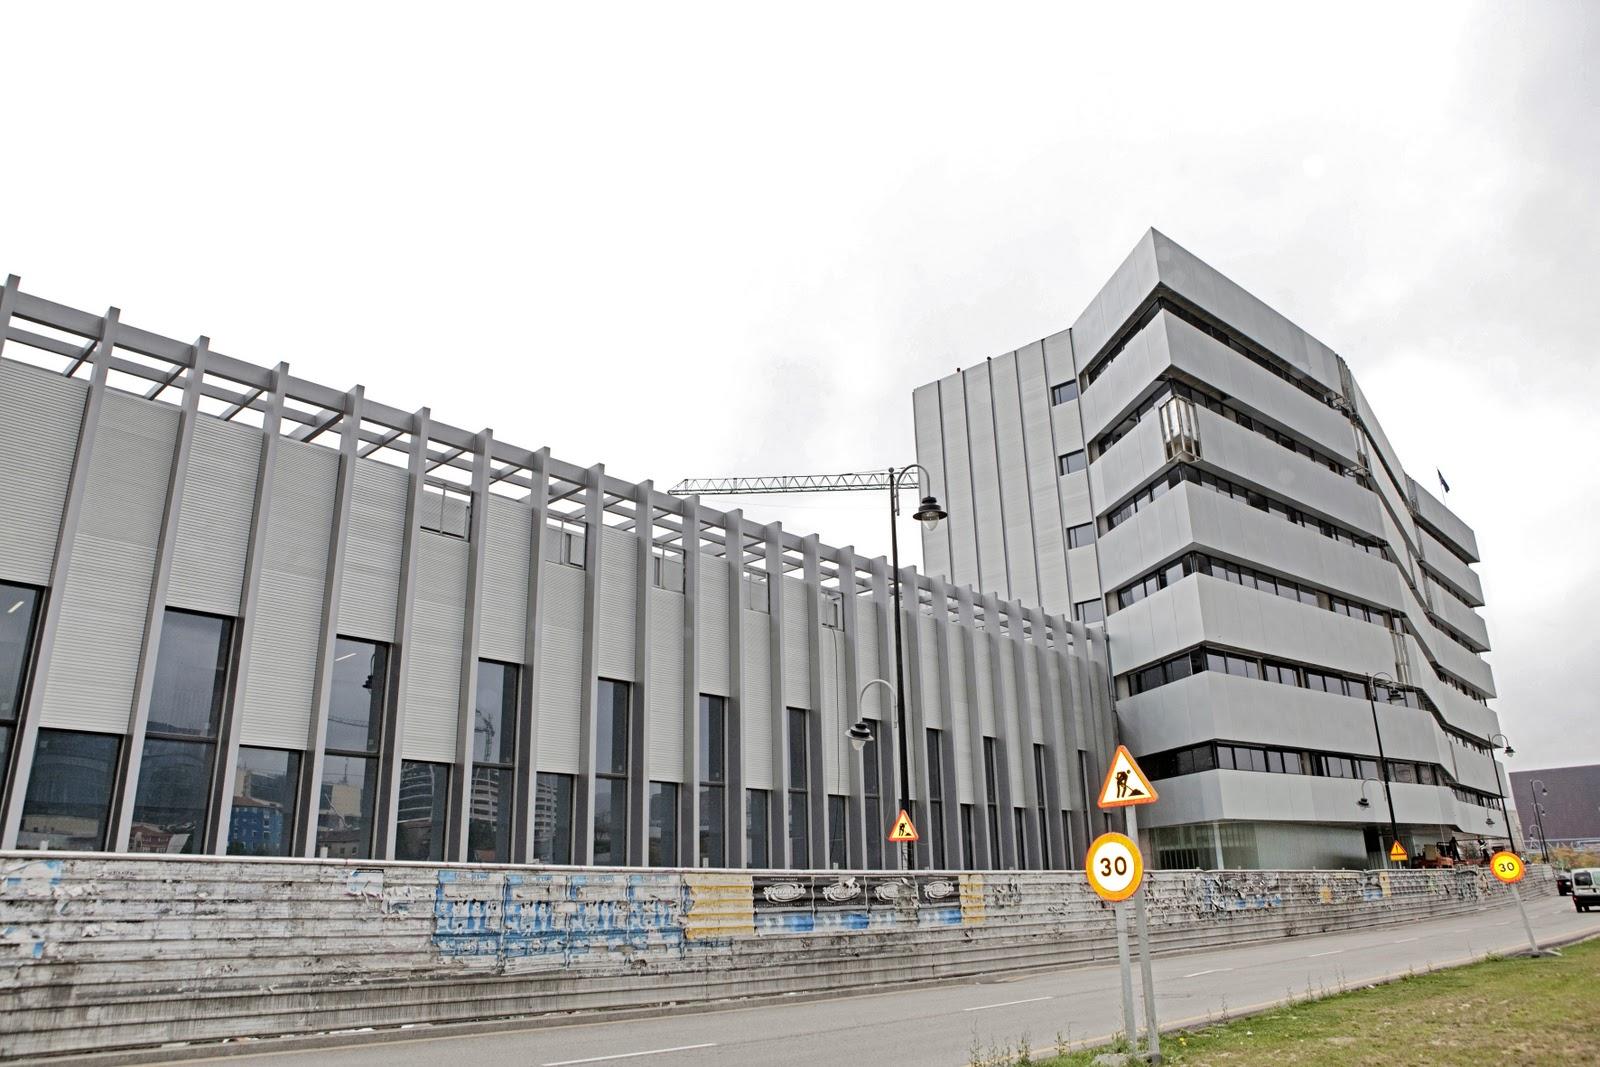 Edificios de bilbao cl nica imq en zorrozaurre medicina for Imq oficinas centrales bilbao bilbao